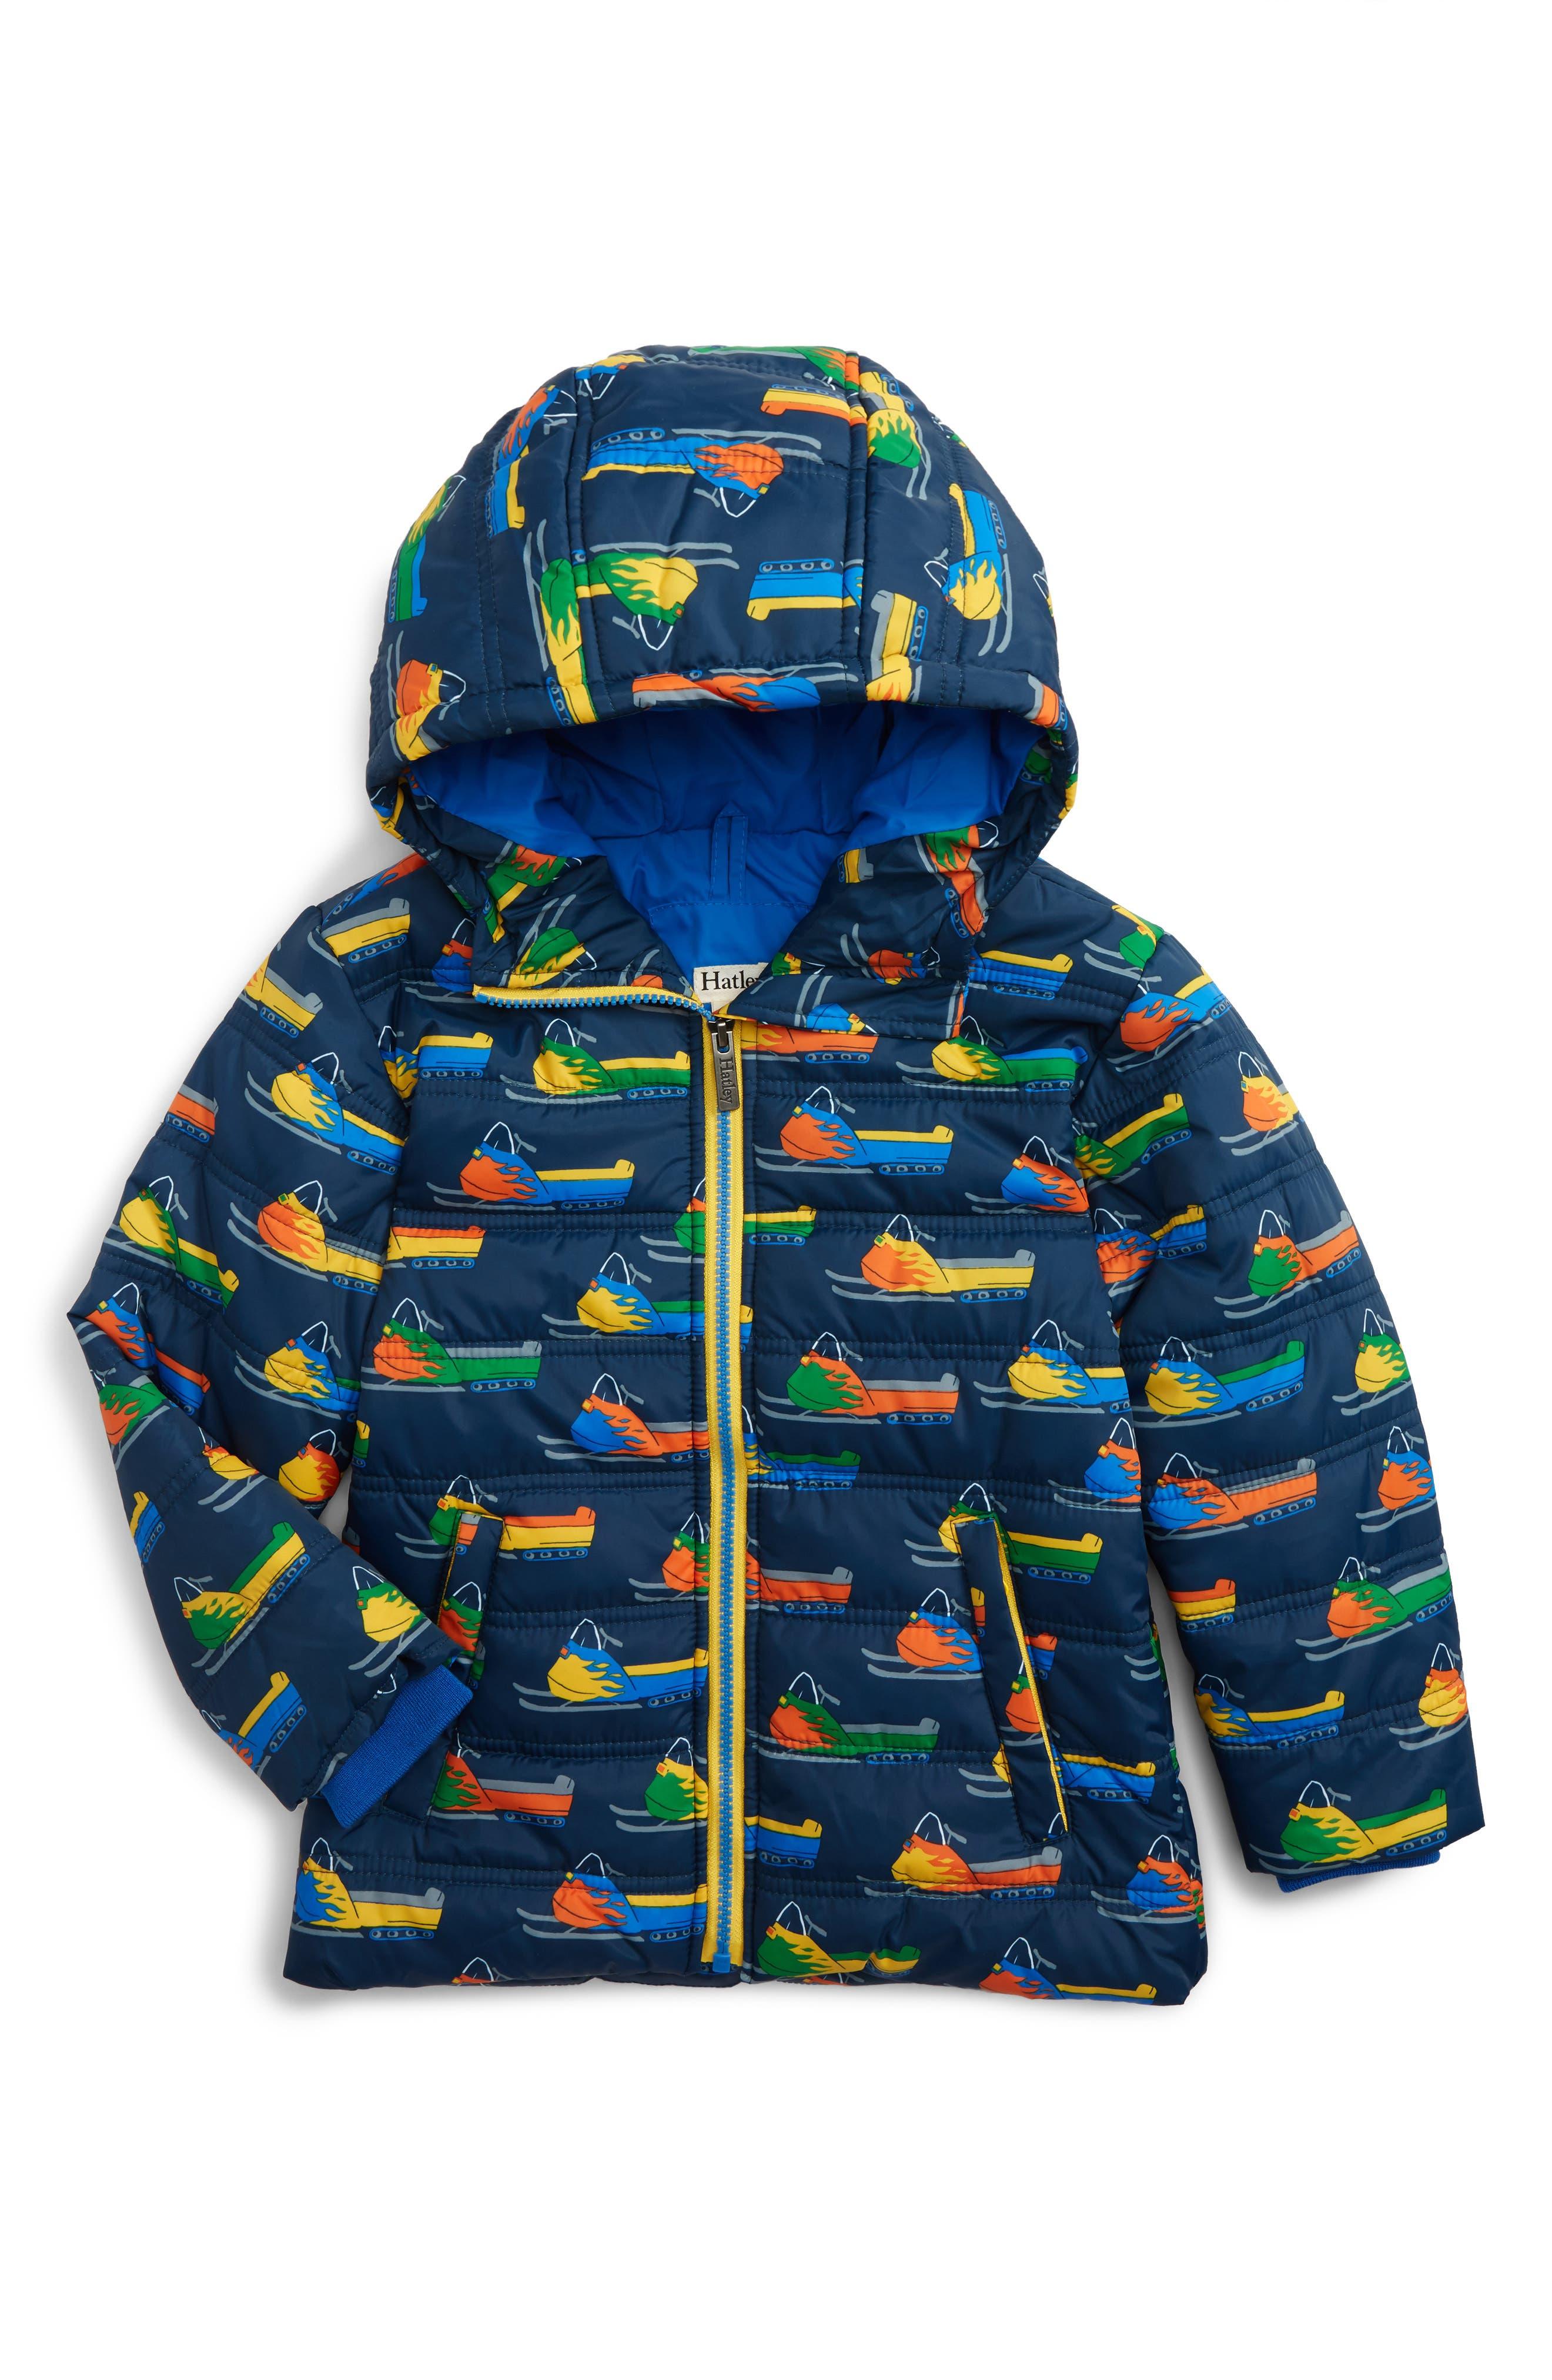 Main Image - Hatley Bobsled Print Puffer Jacket (Toddler Boys, Little Boys & Big Boys)